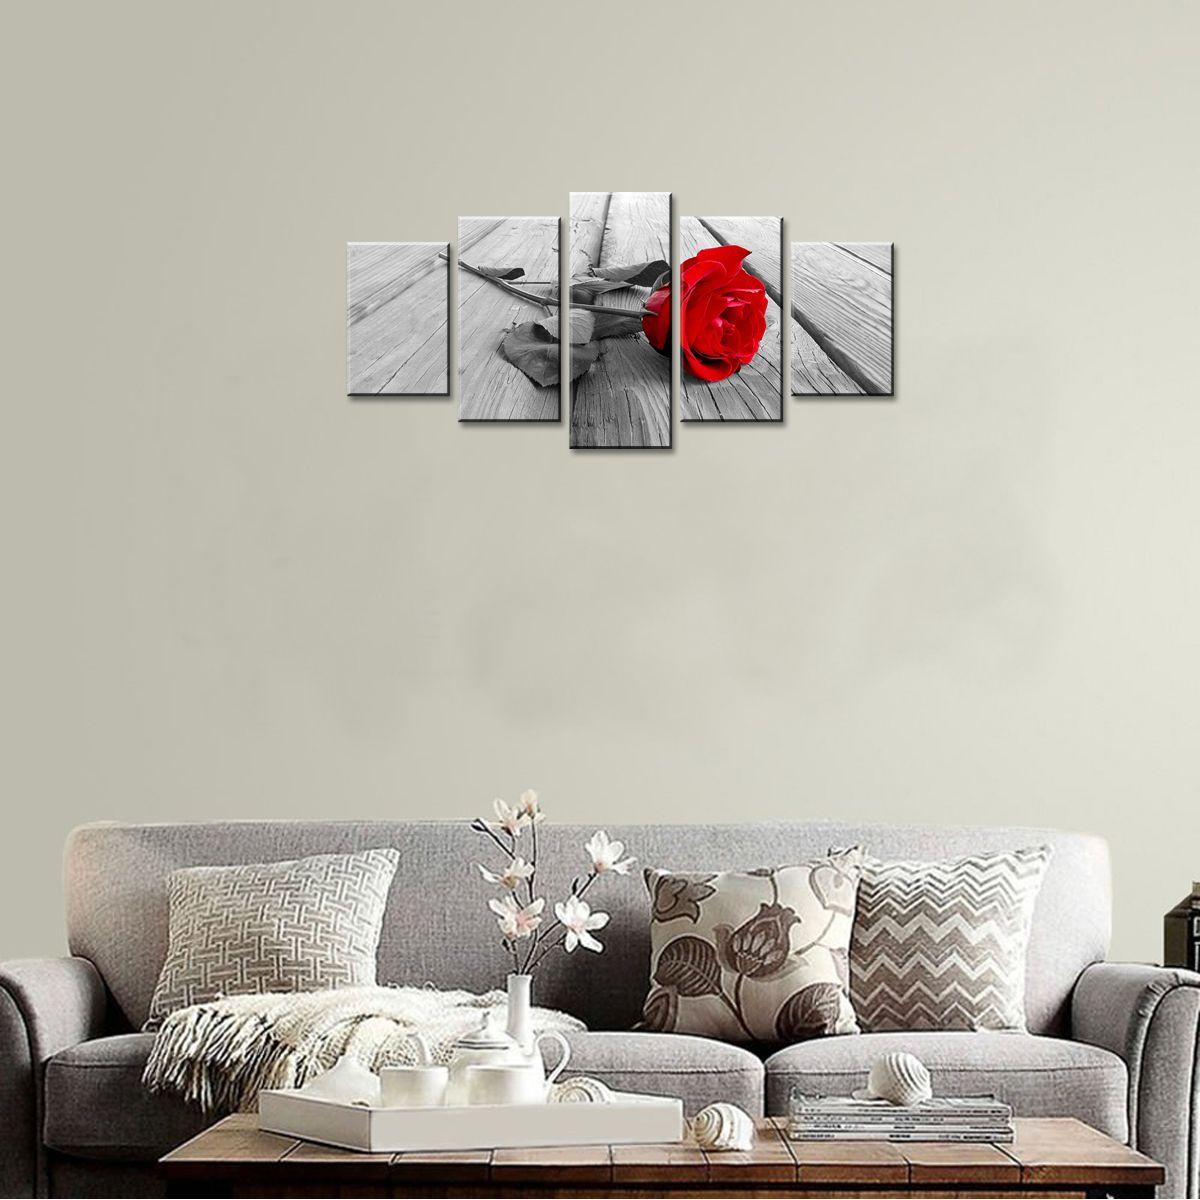 Rote Rose Blume Malerei Leinwand Wandkunst moderne Bild Home Decor Floral HD Giclee Artwork 5 Panels gestreckt auf gerahmt